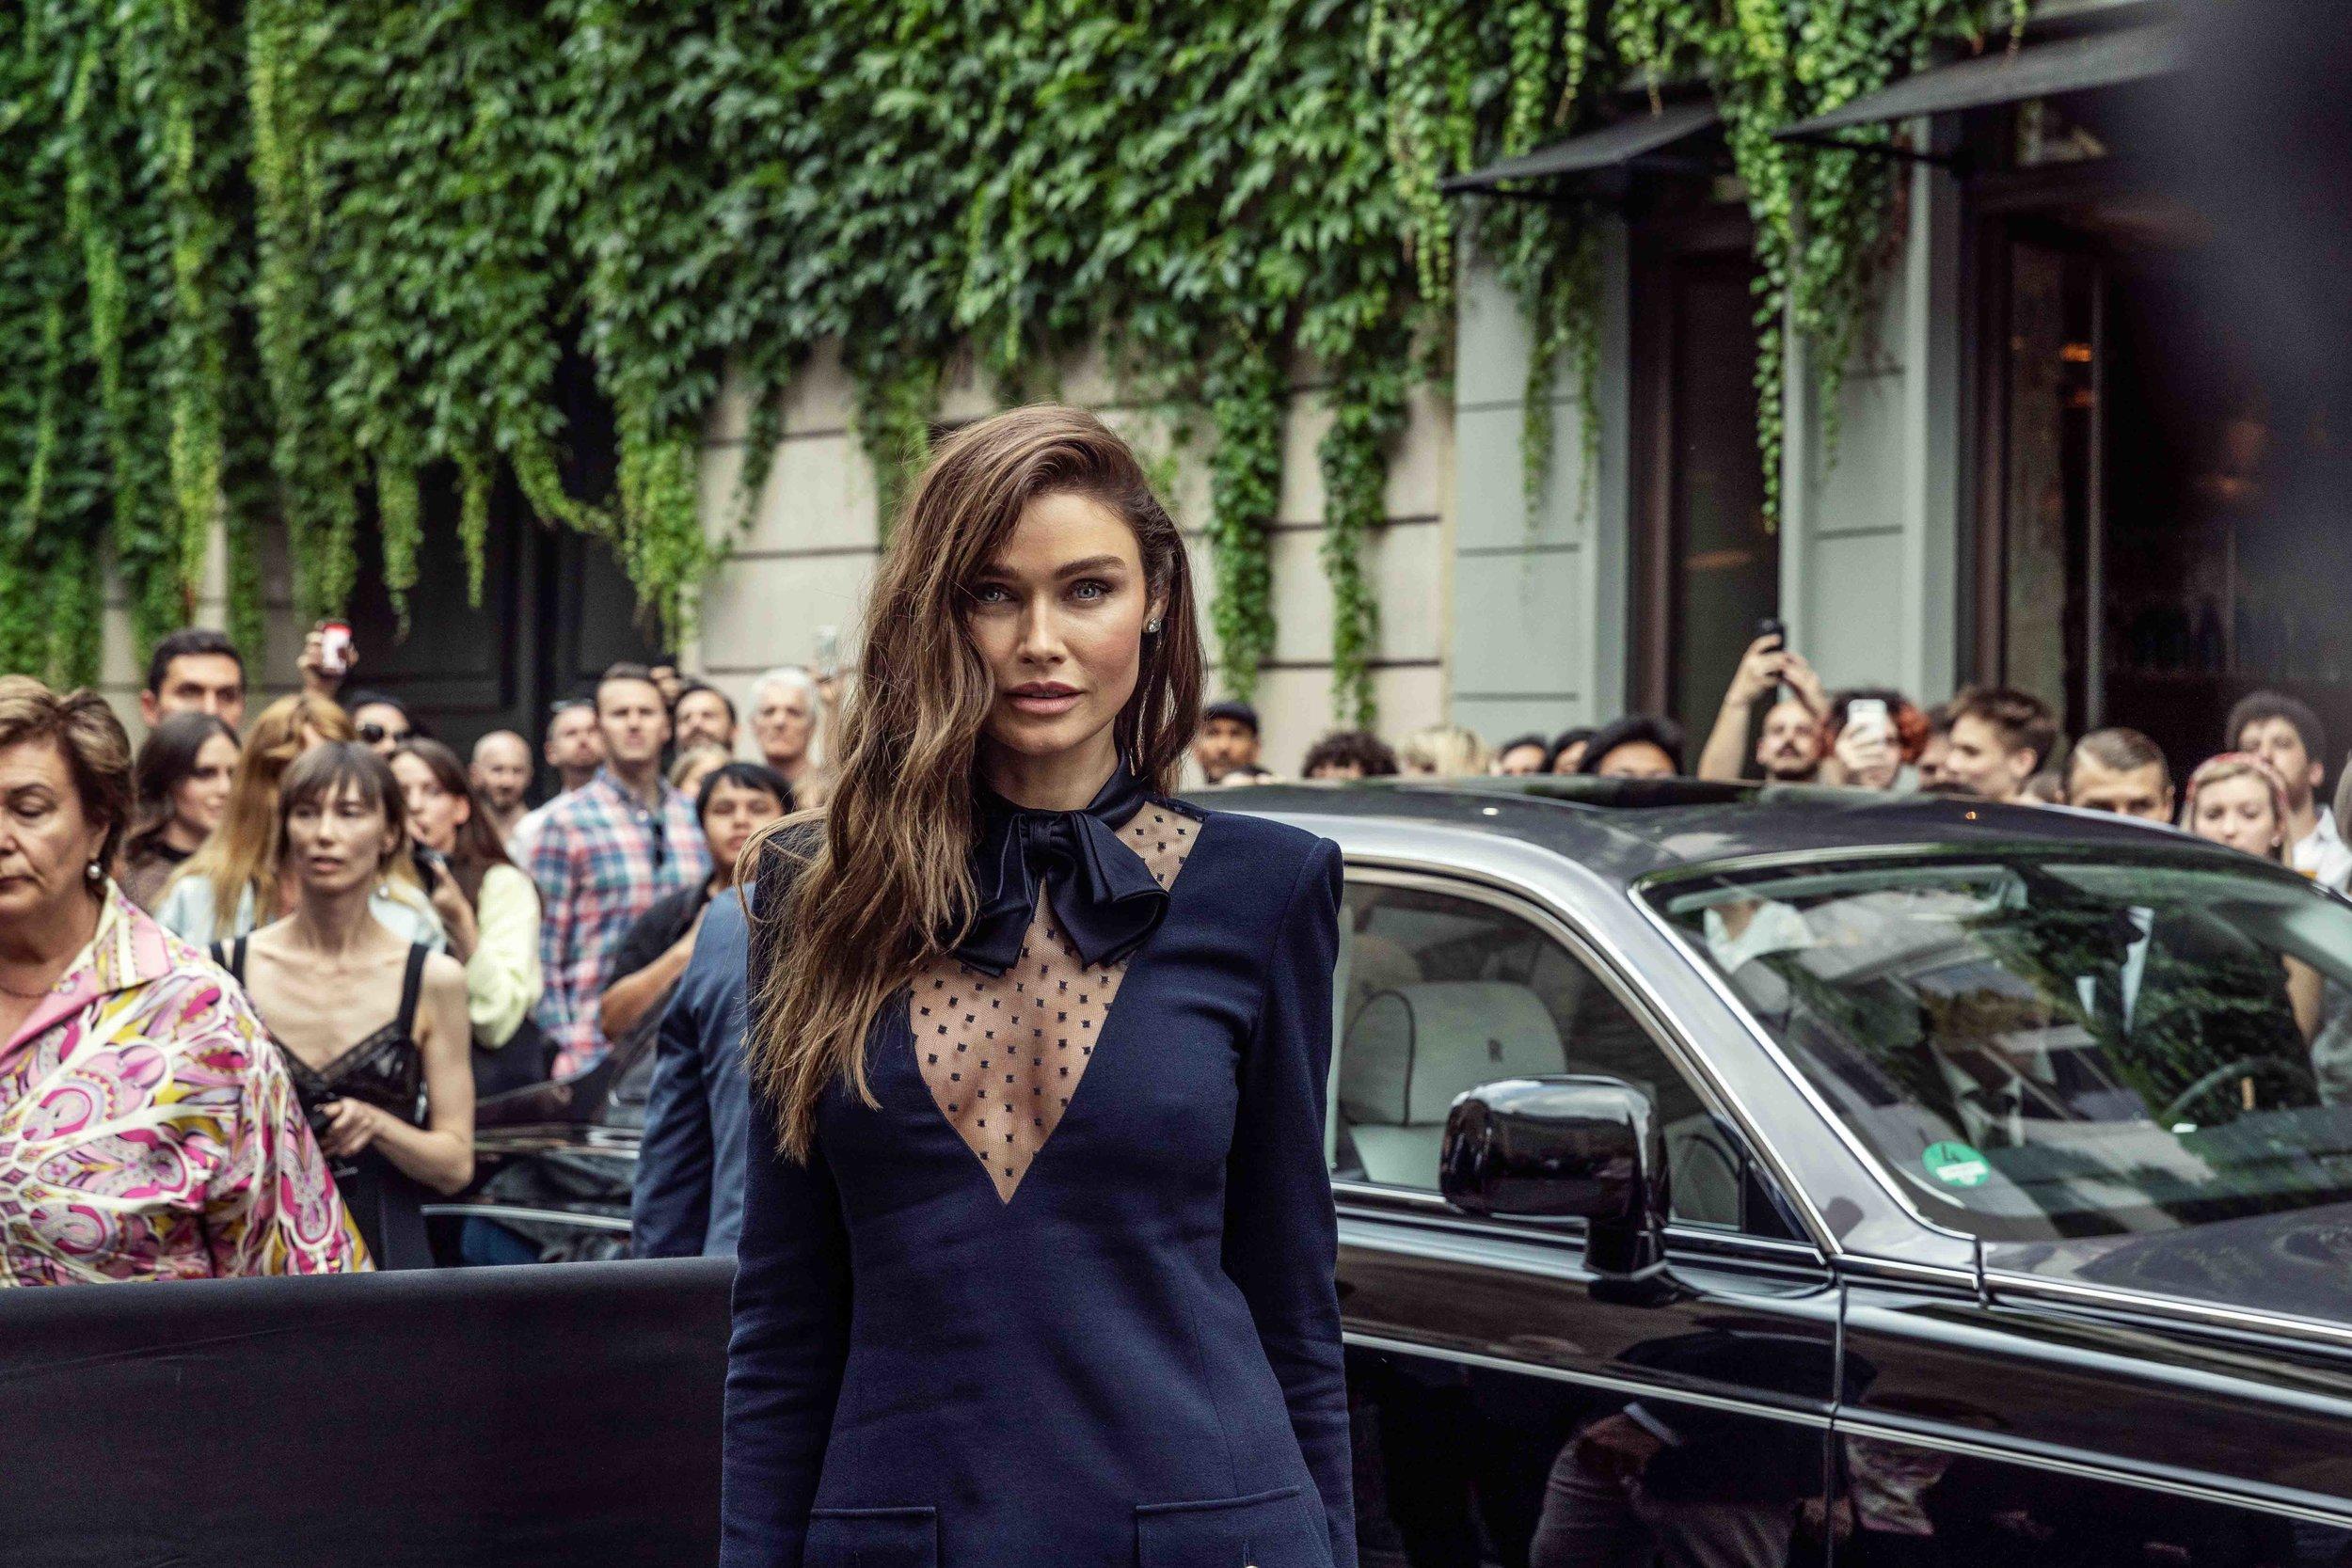 Sarah Mutch at Paris Fashion Week - Haute Couture at Givenchy